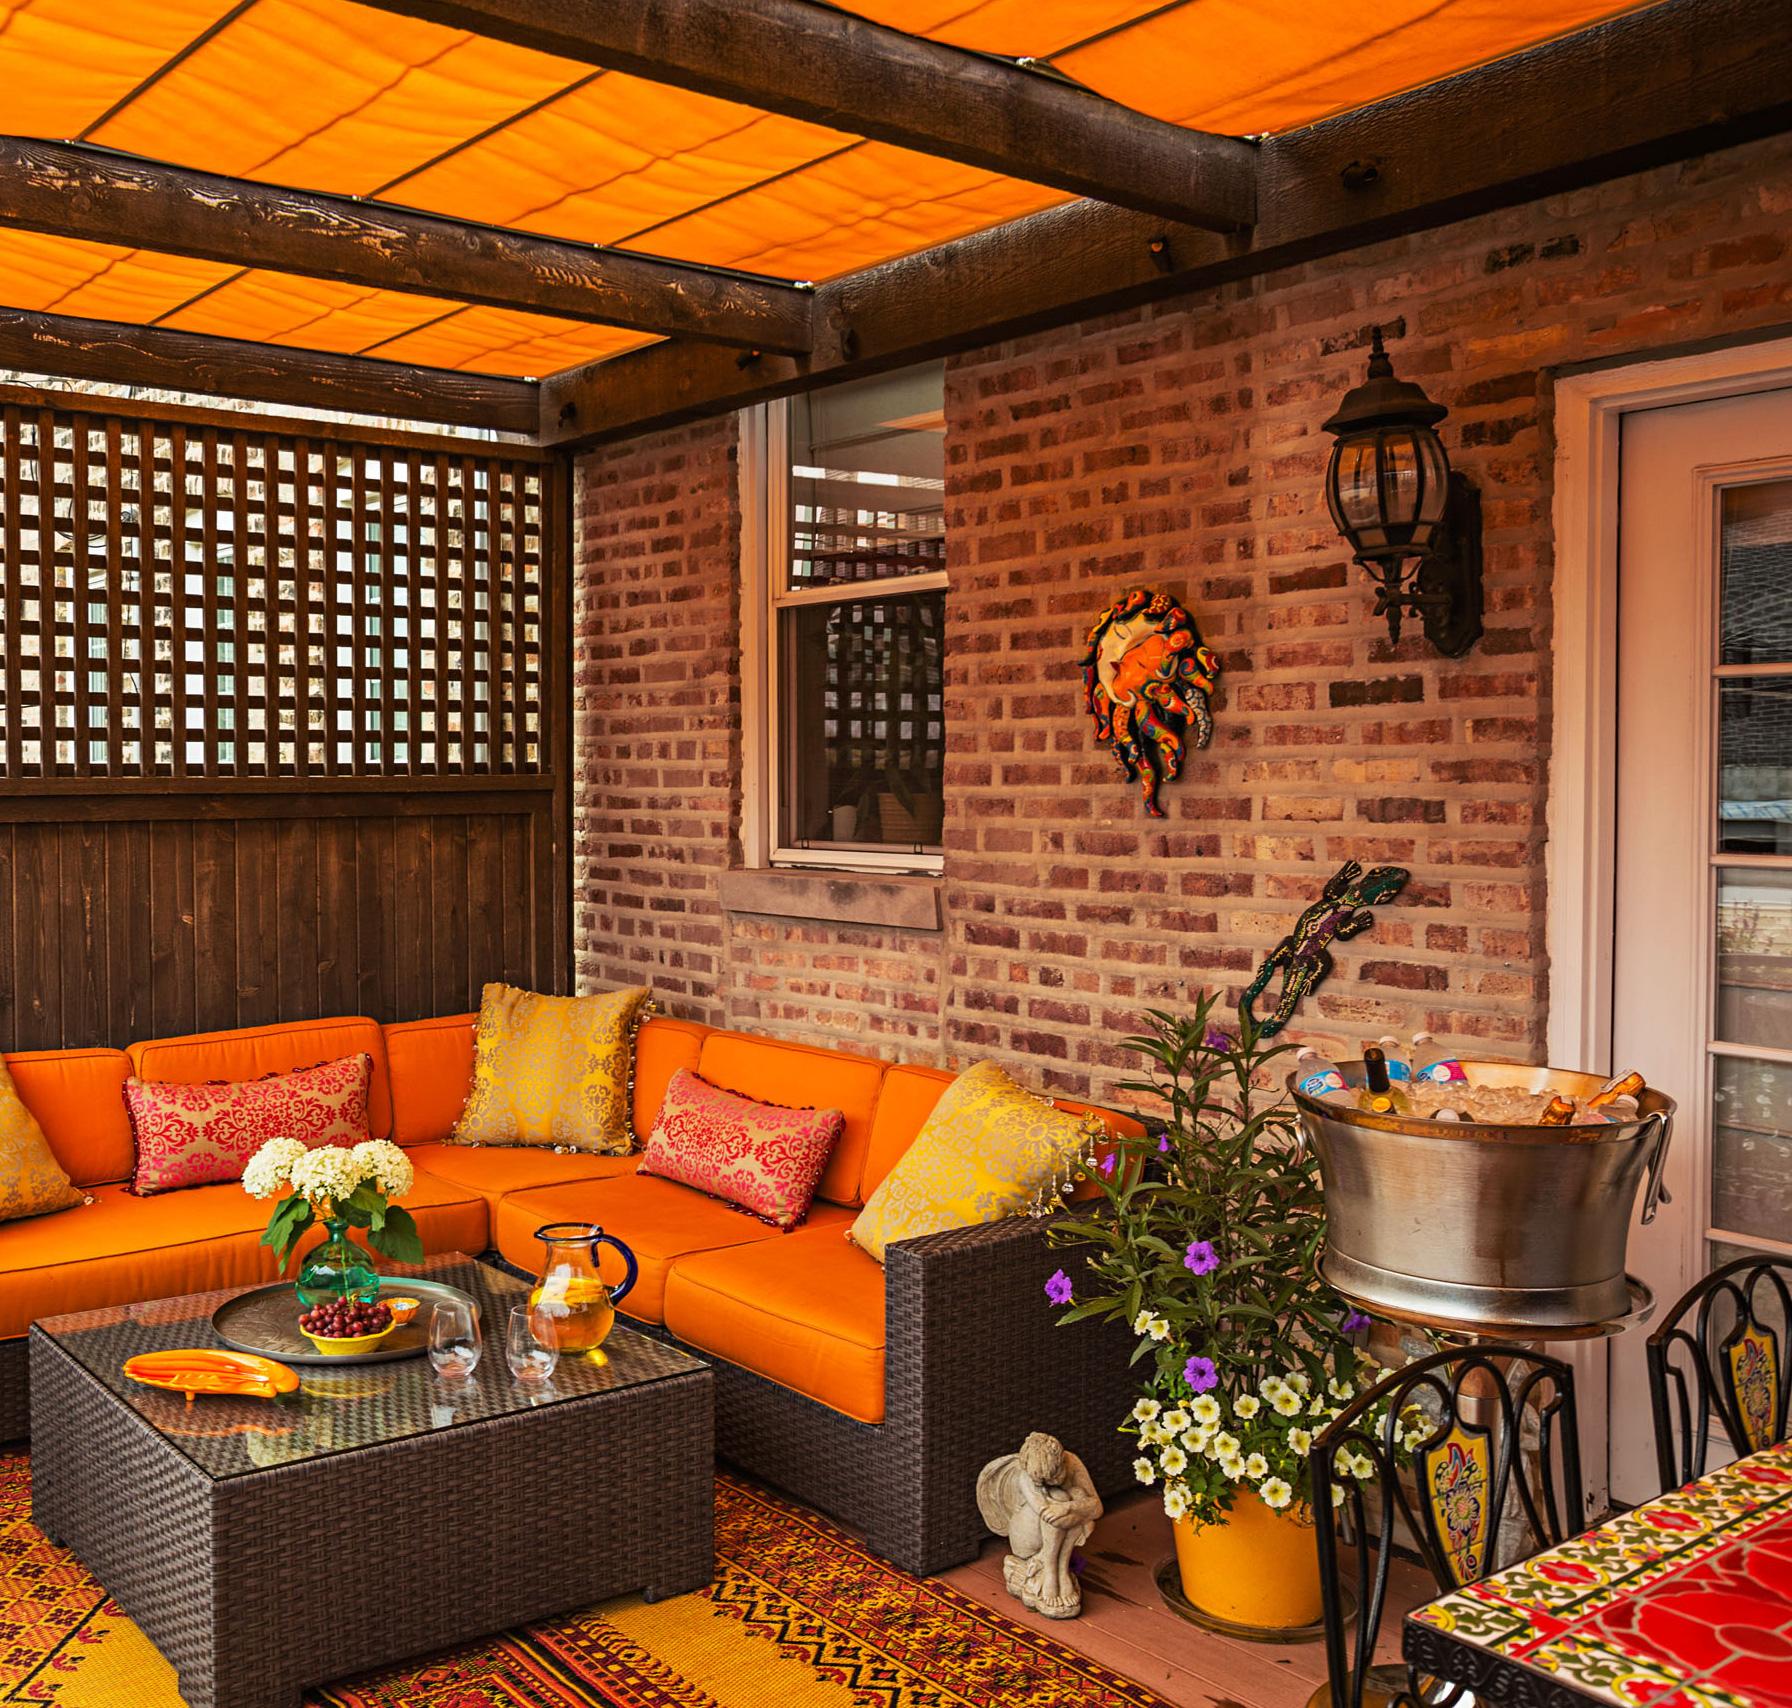 Balcony furnishings